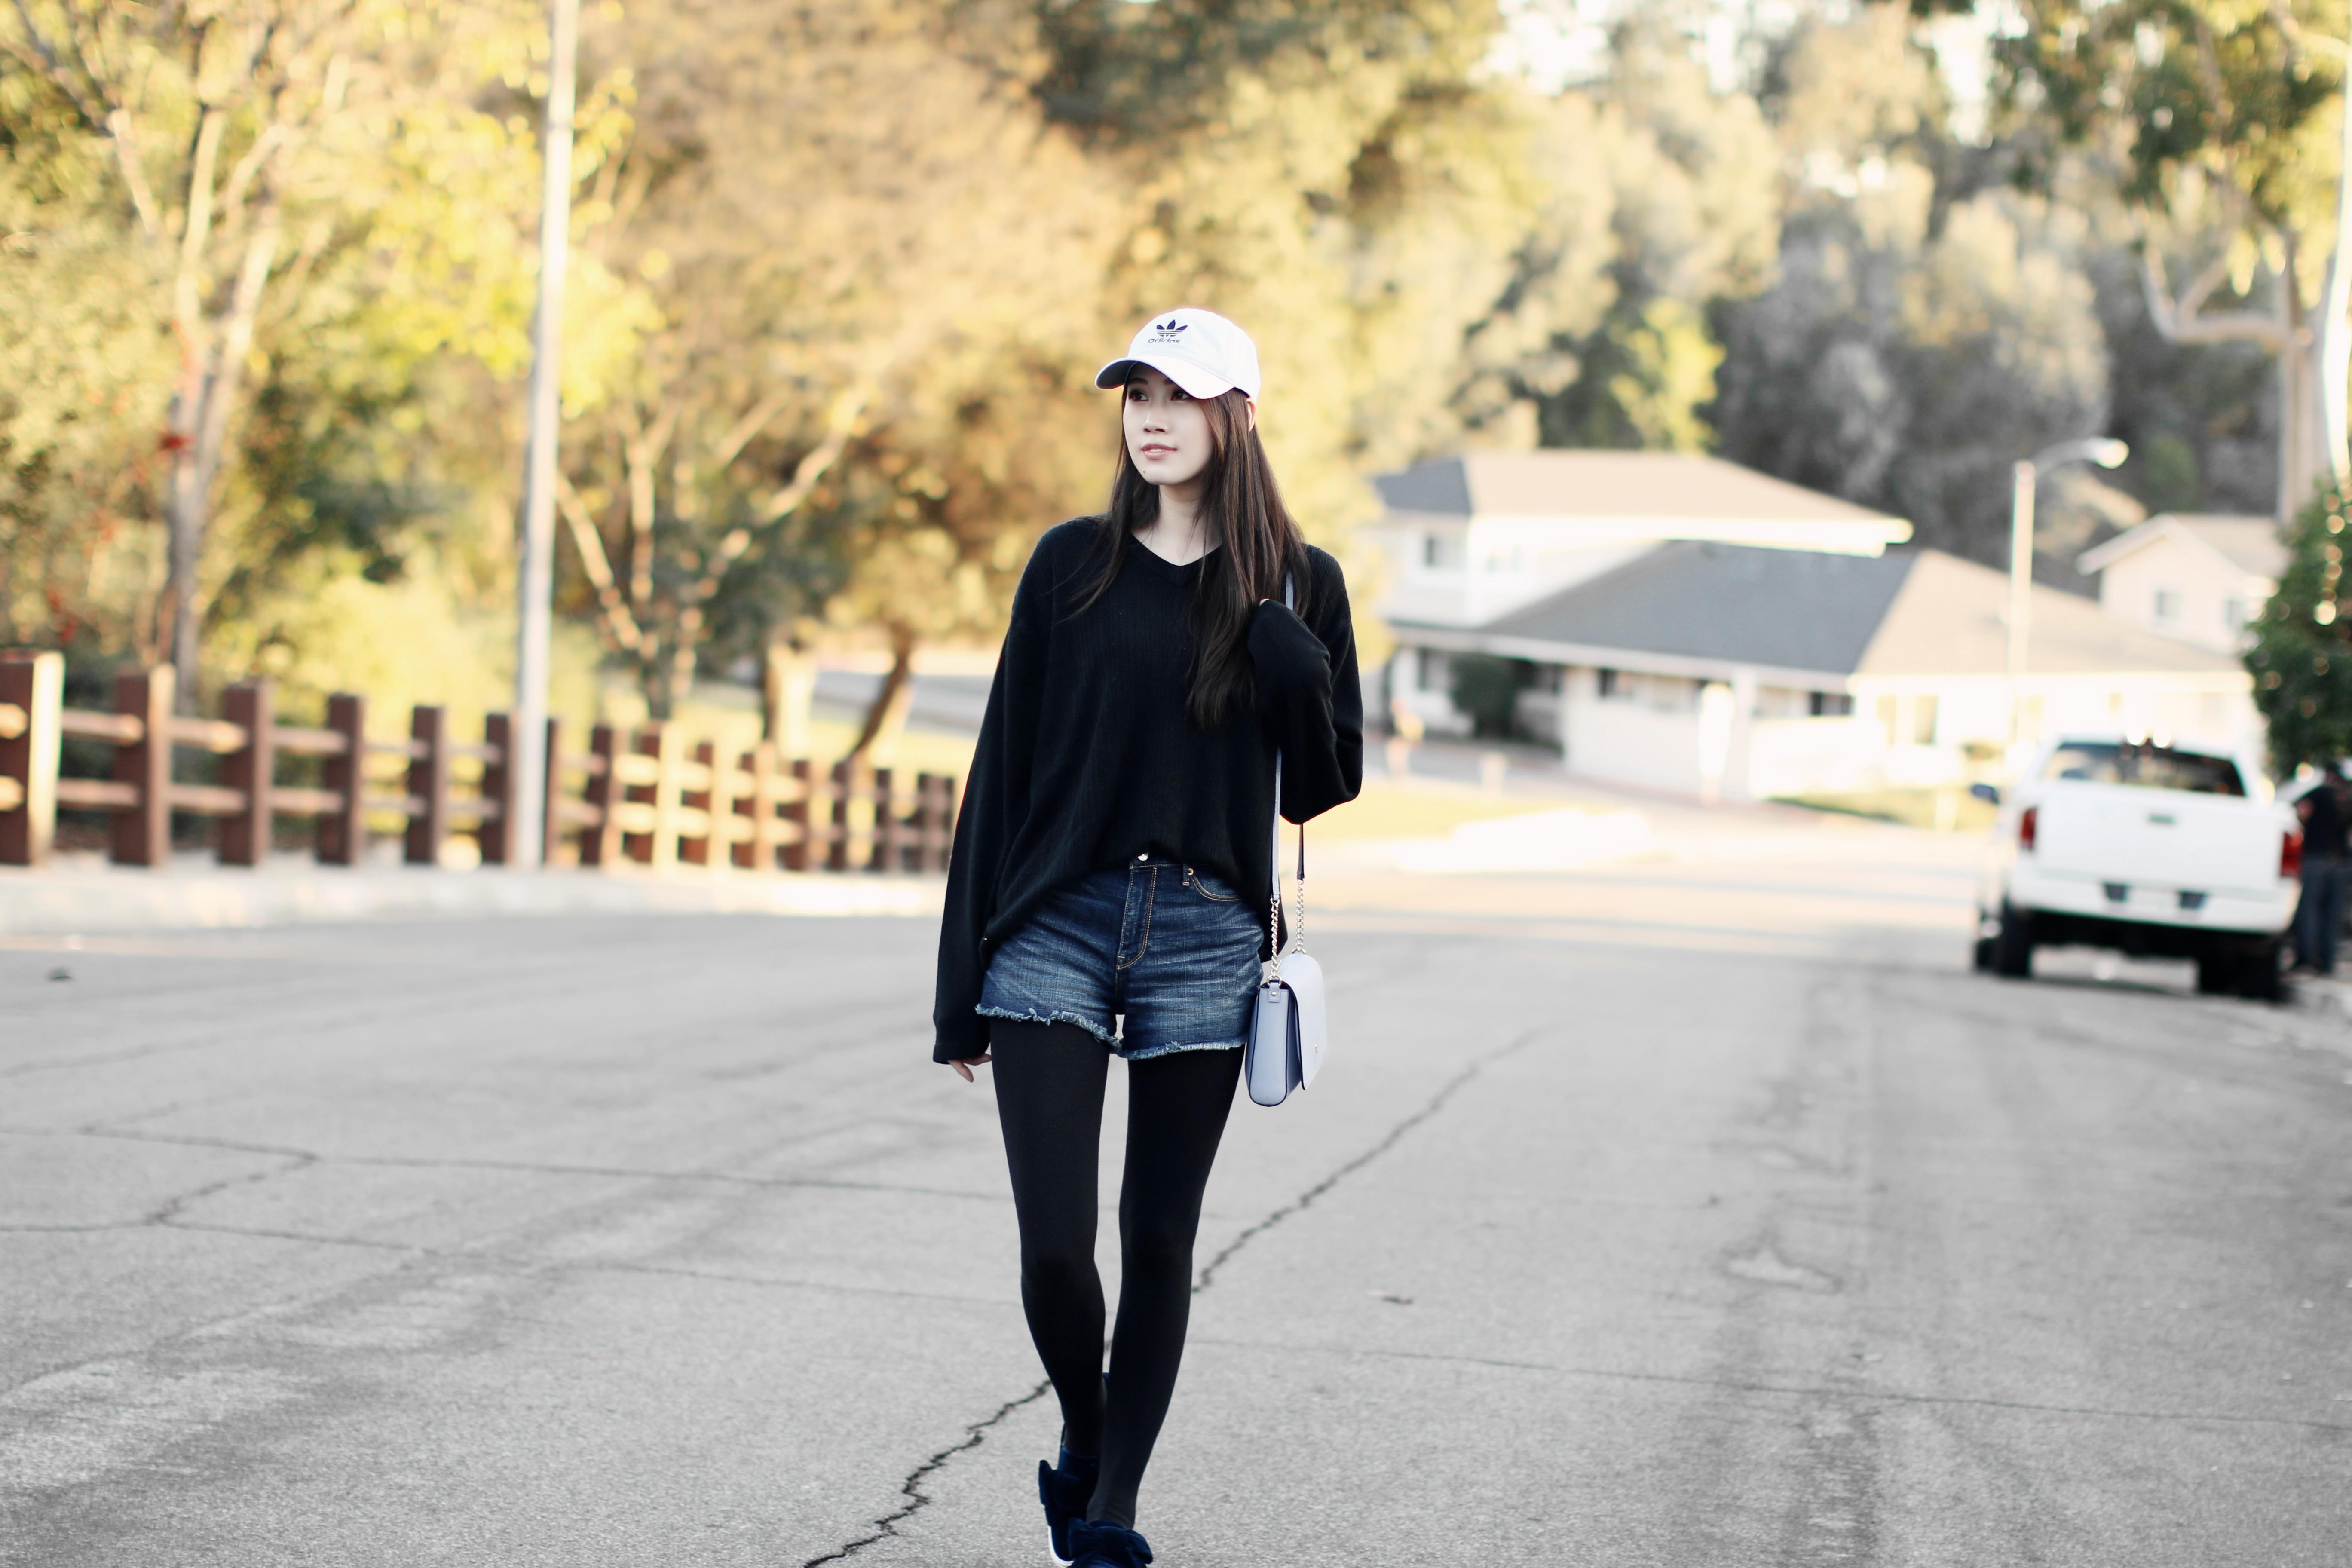 4344-ootd-fashion-style-outfitoftheday-wiwt-streetstyle-adidas-urbanoutfitters-hm-f21xme-nike-elizabeeetht-clothestoyouuu